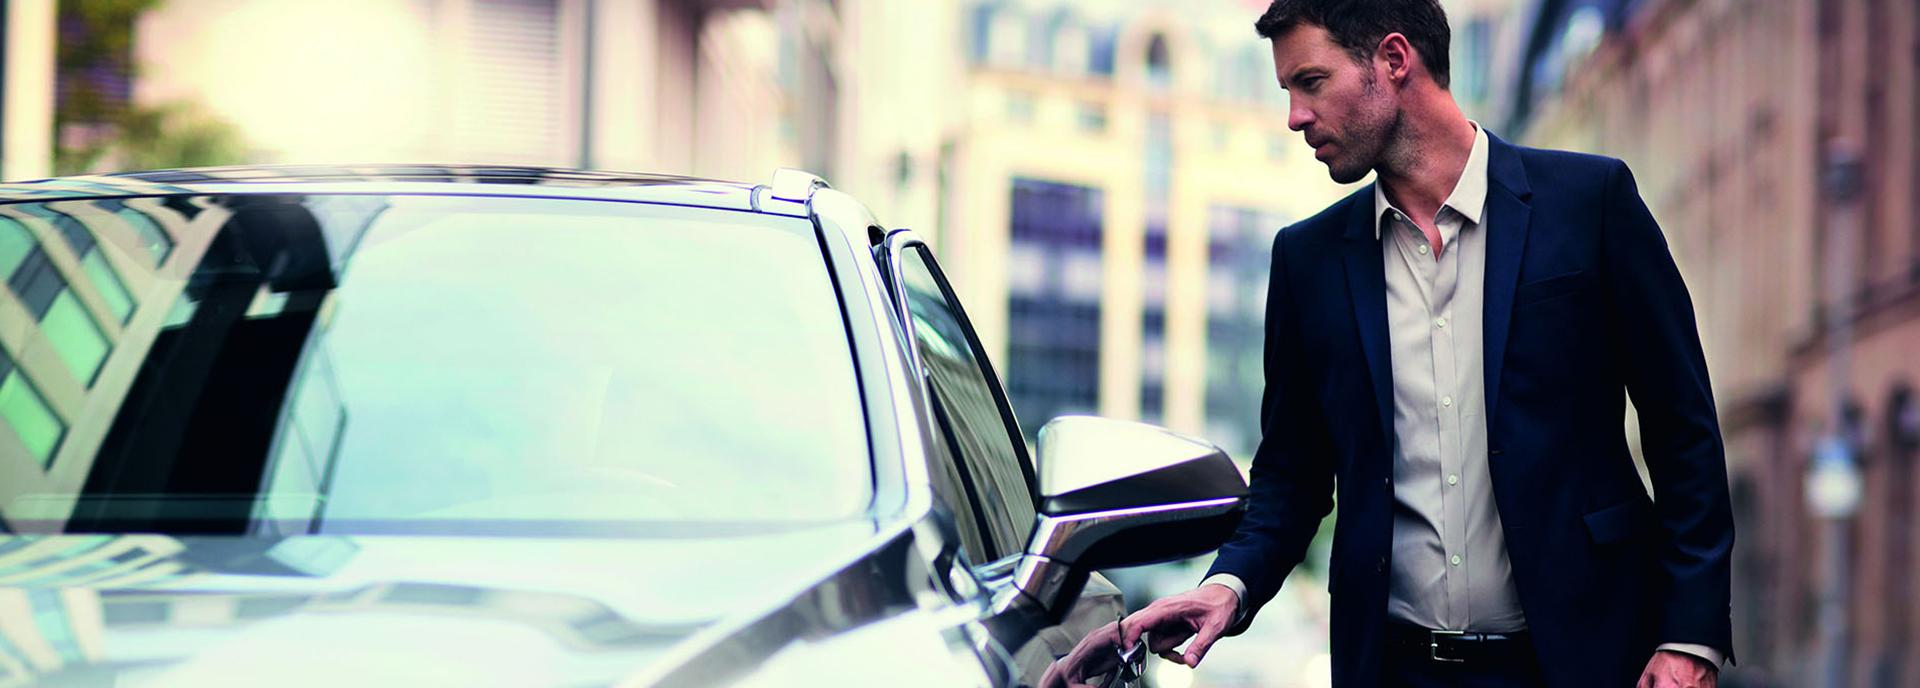 man in net pak opent deur Lexus